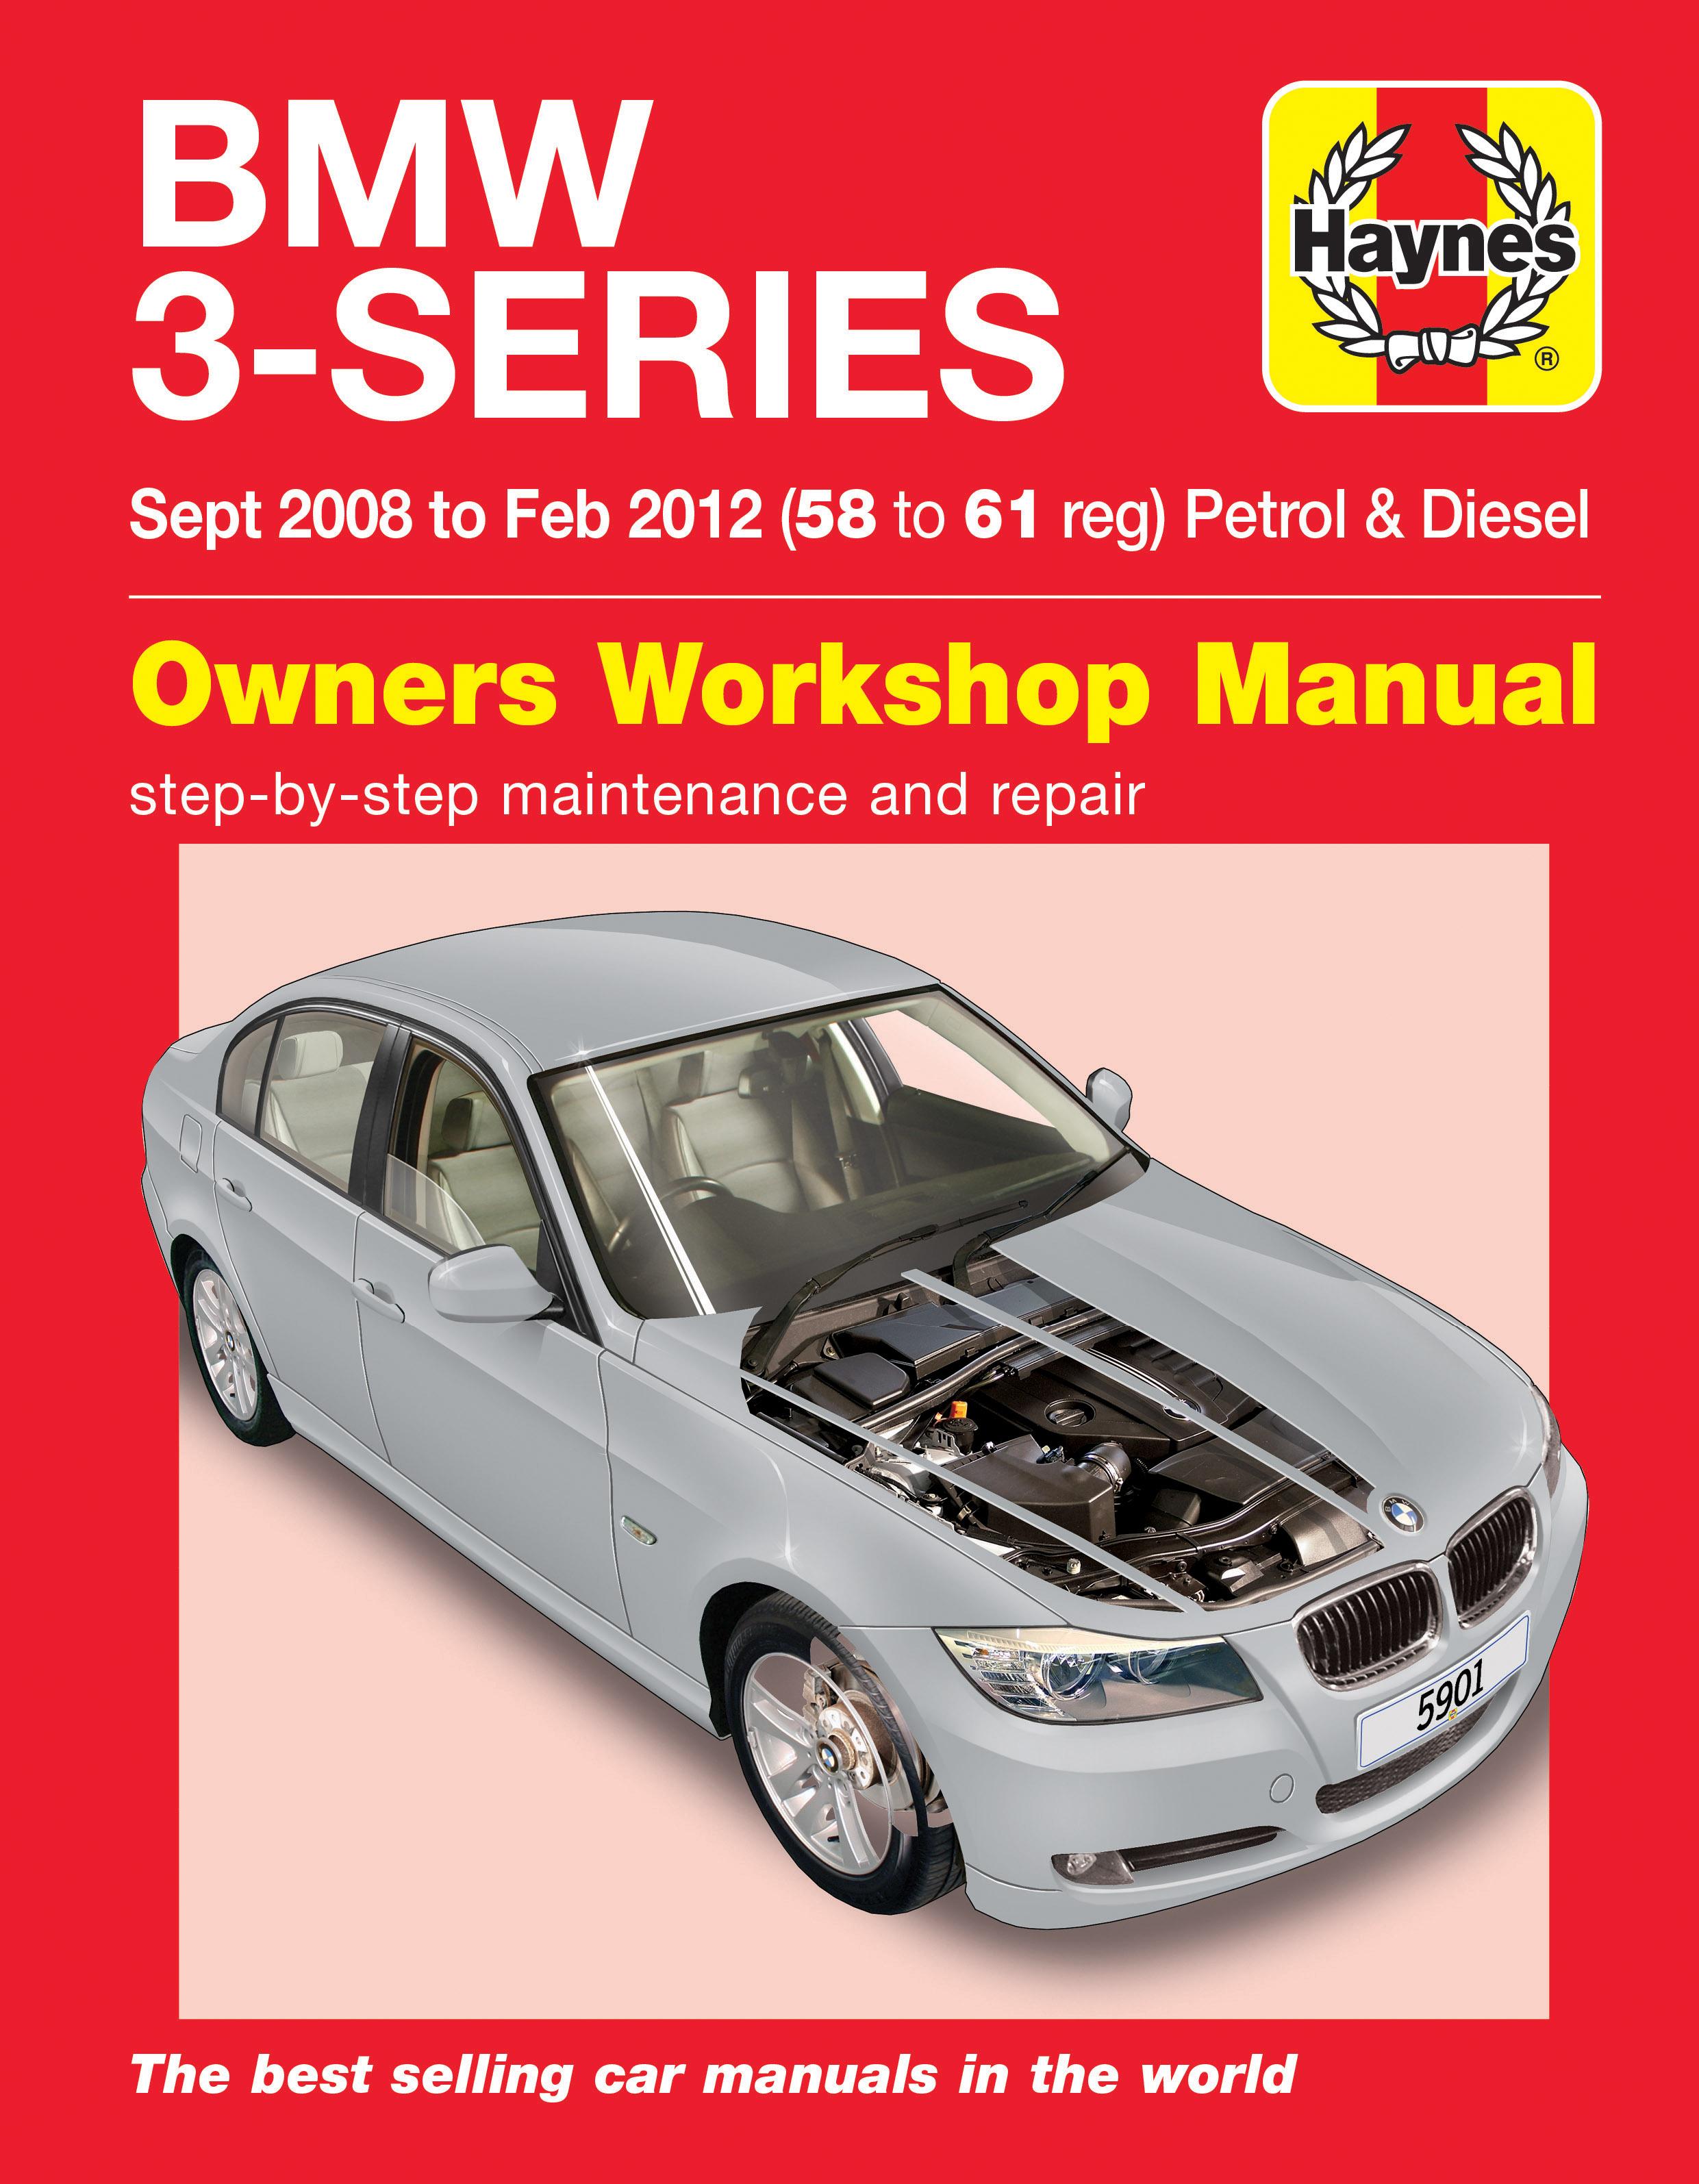 haynes motorcycle repair manuals pdf